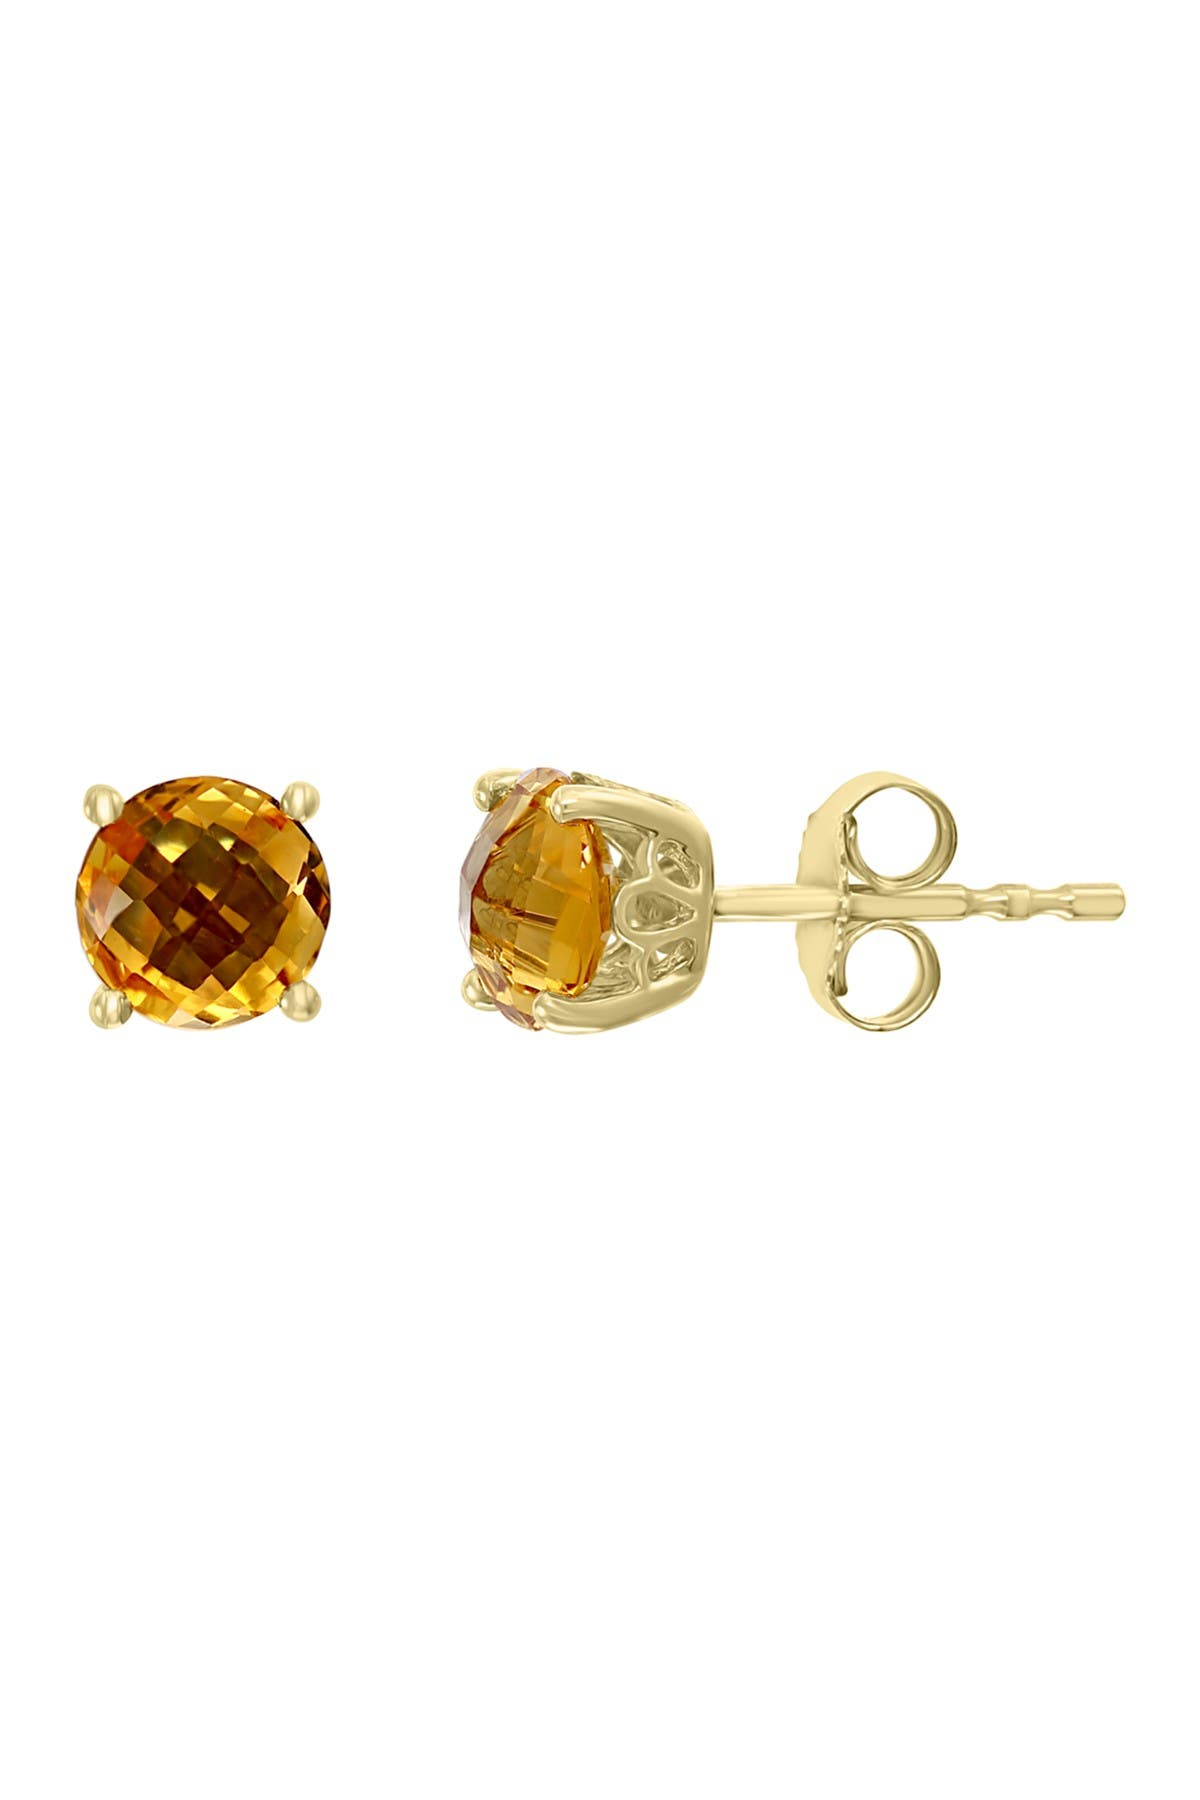 Citrine Stud Earrings 925 Sterling Silver Citrine Jewellery Yellow Gemstone Studs